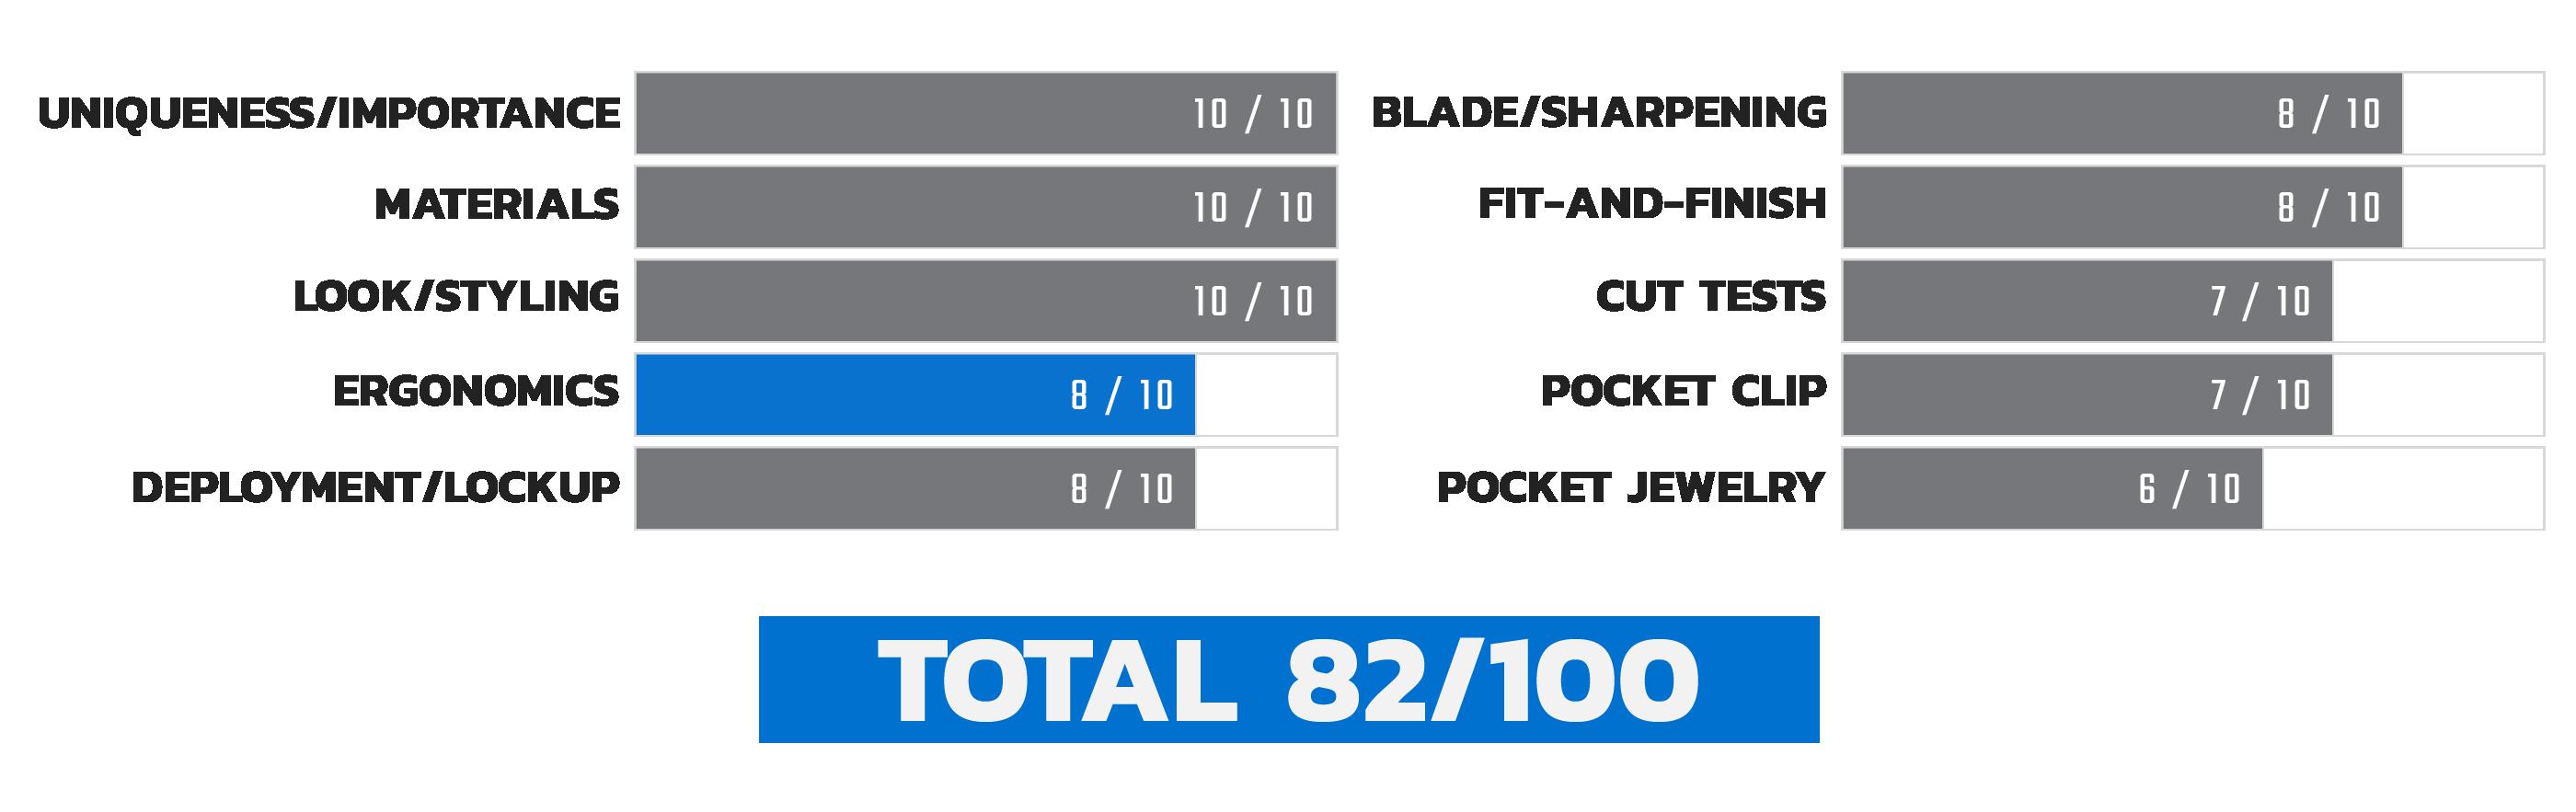 Launch 4 Ergonomics Score Chart